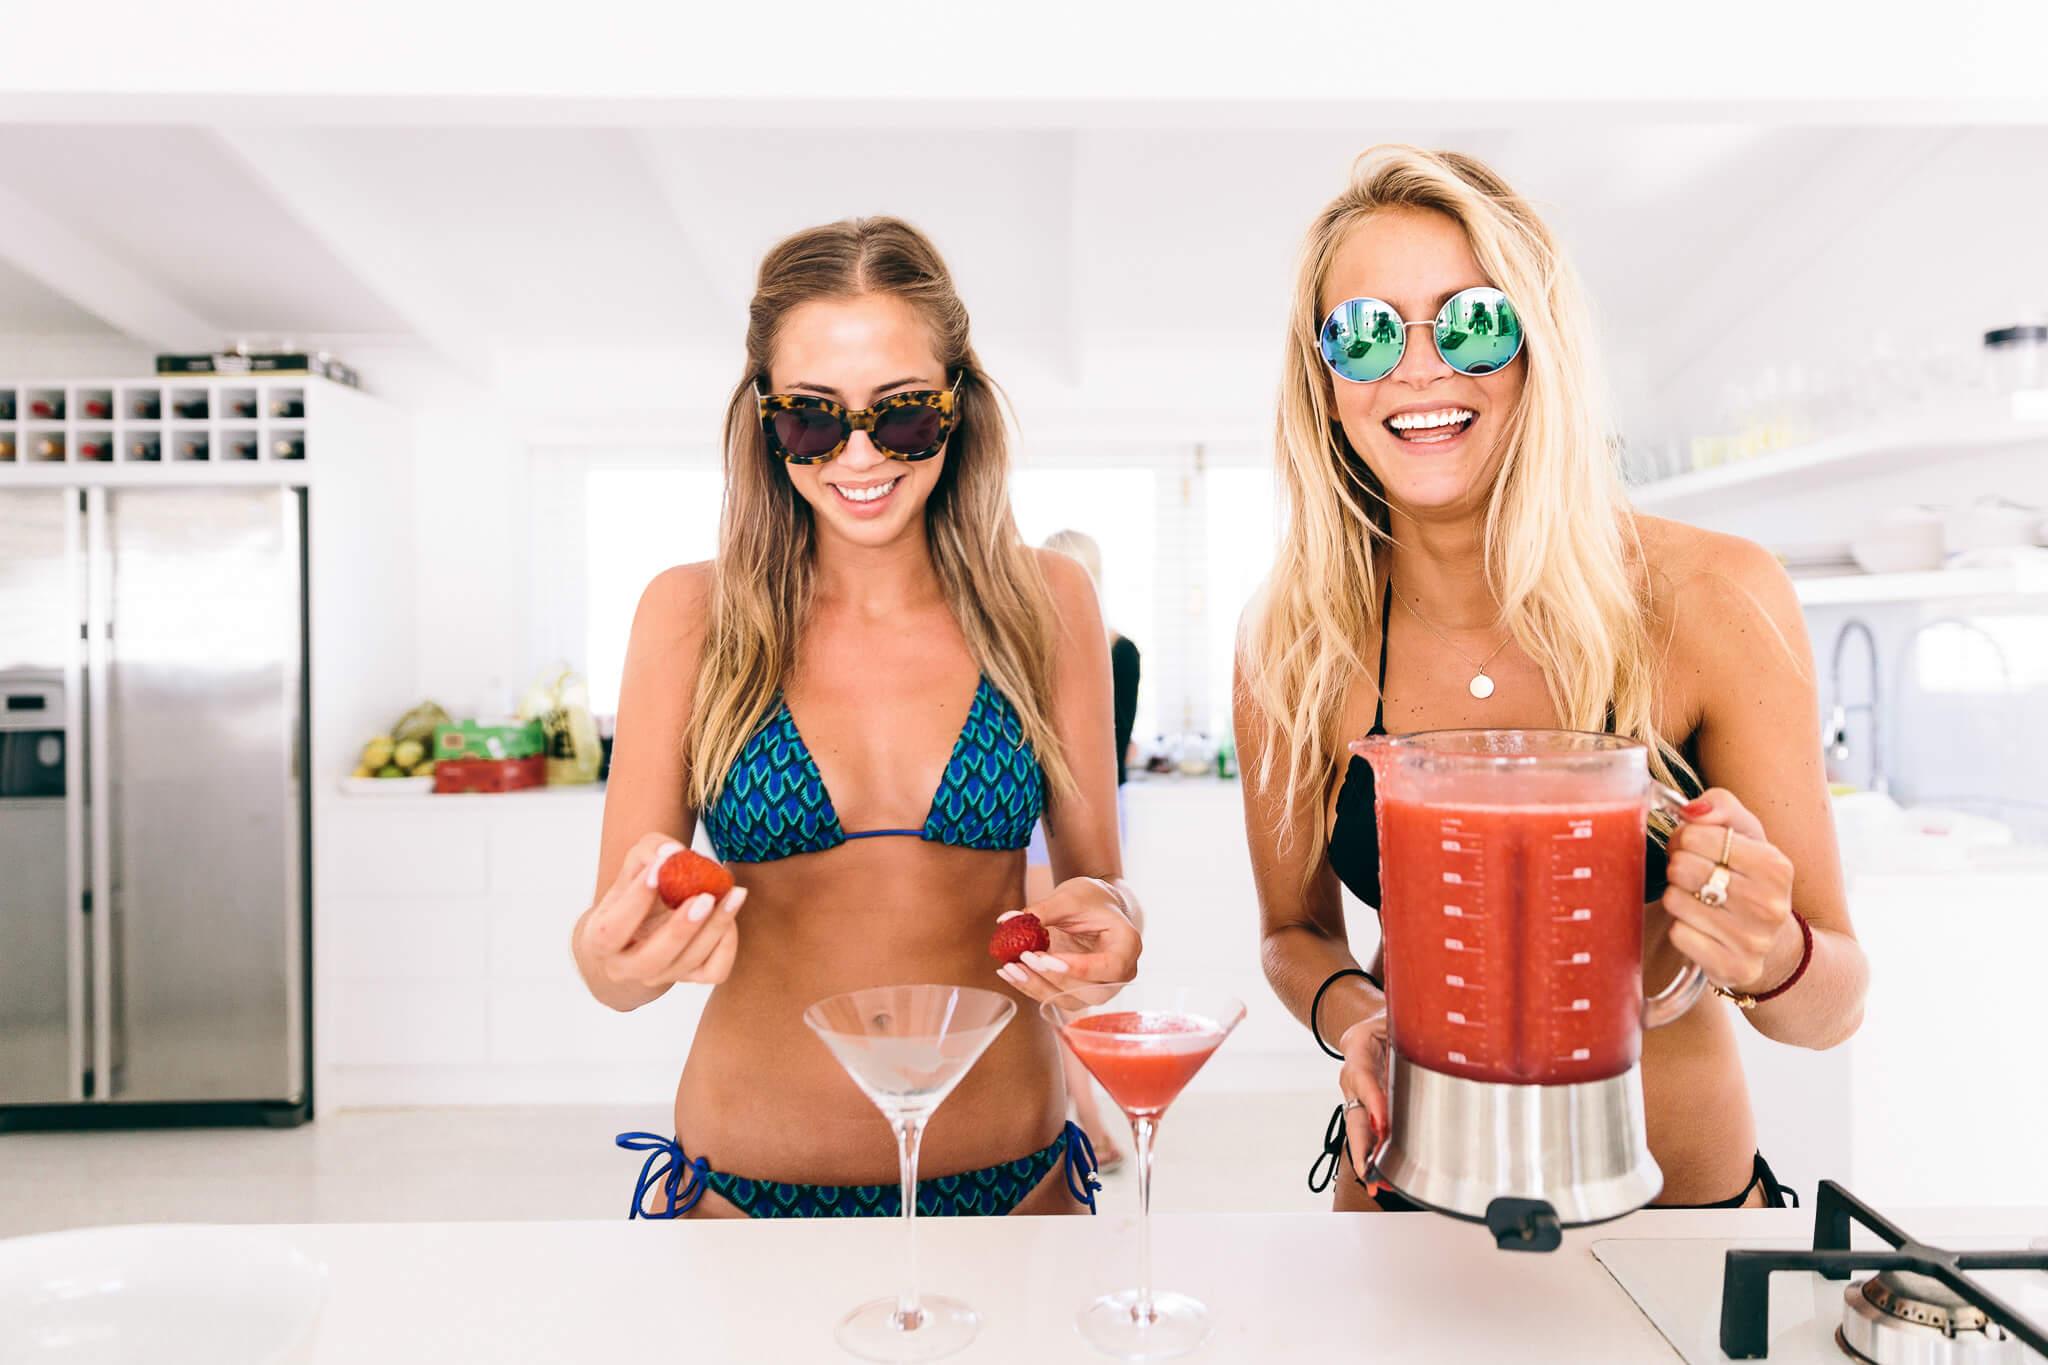 Selfie Rocio Marengo nude (65 photos), Tits, Cleavage, Twitter, in bikini 2020